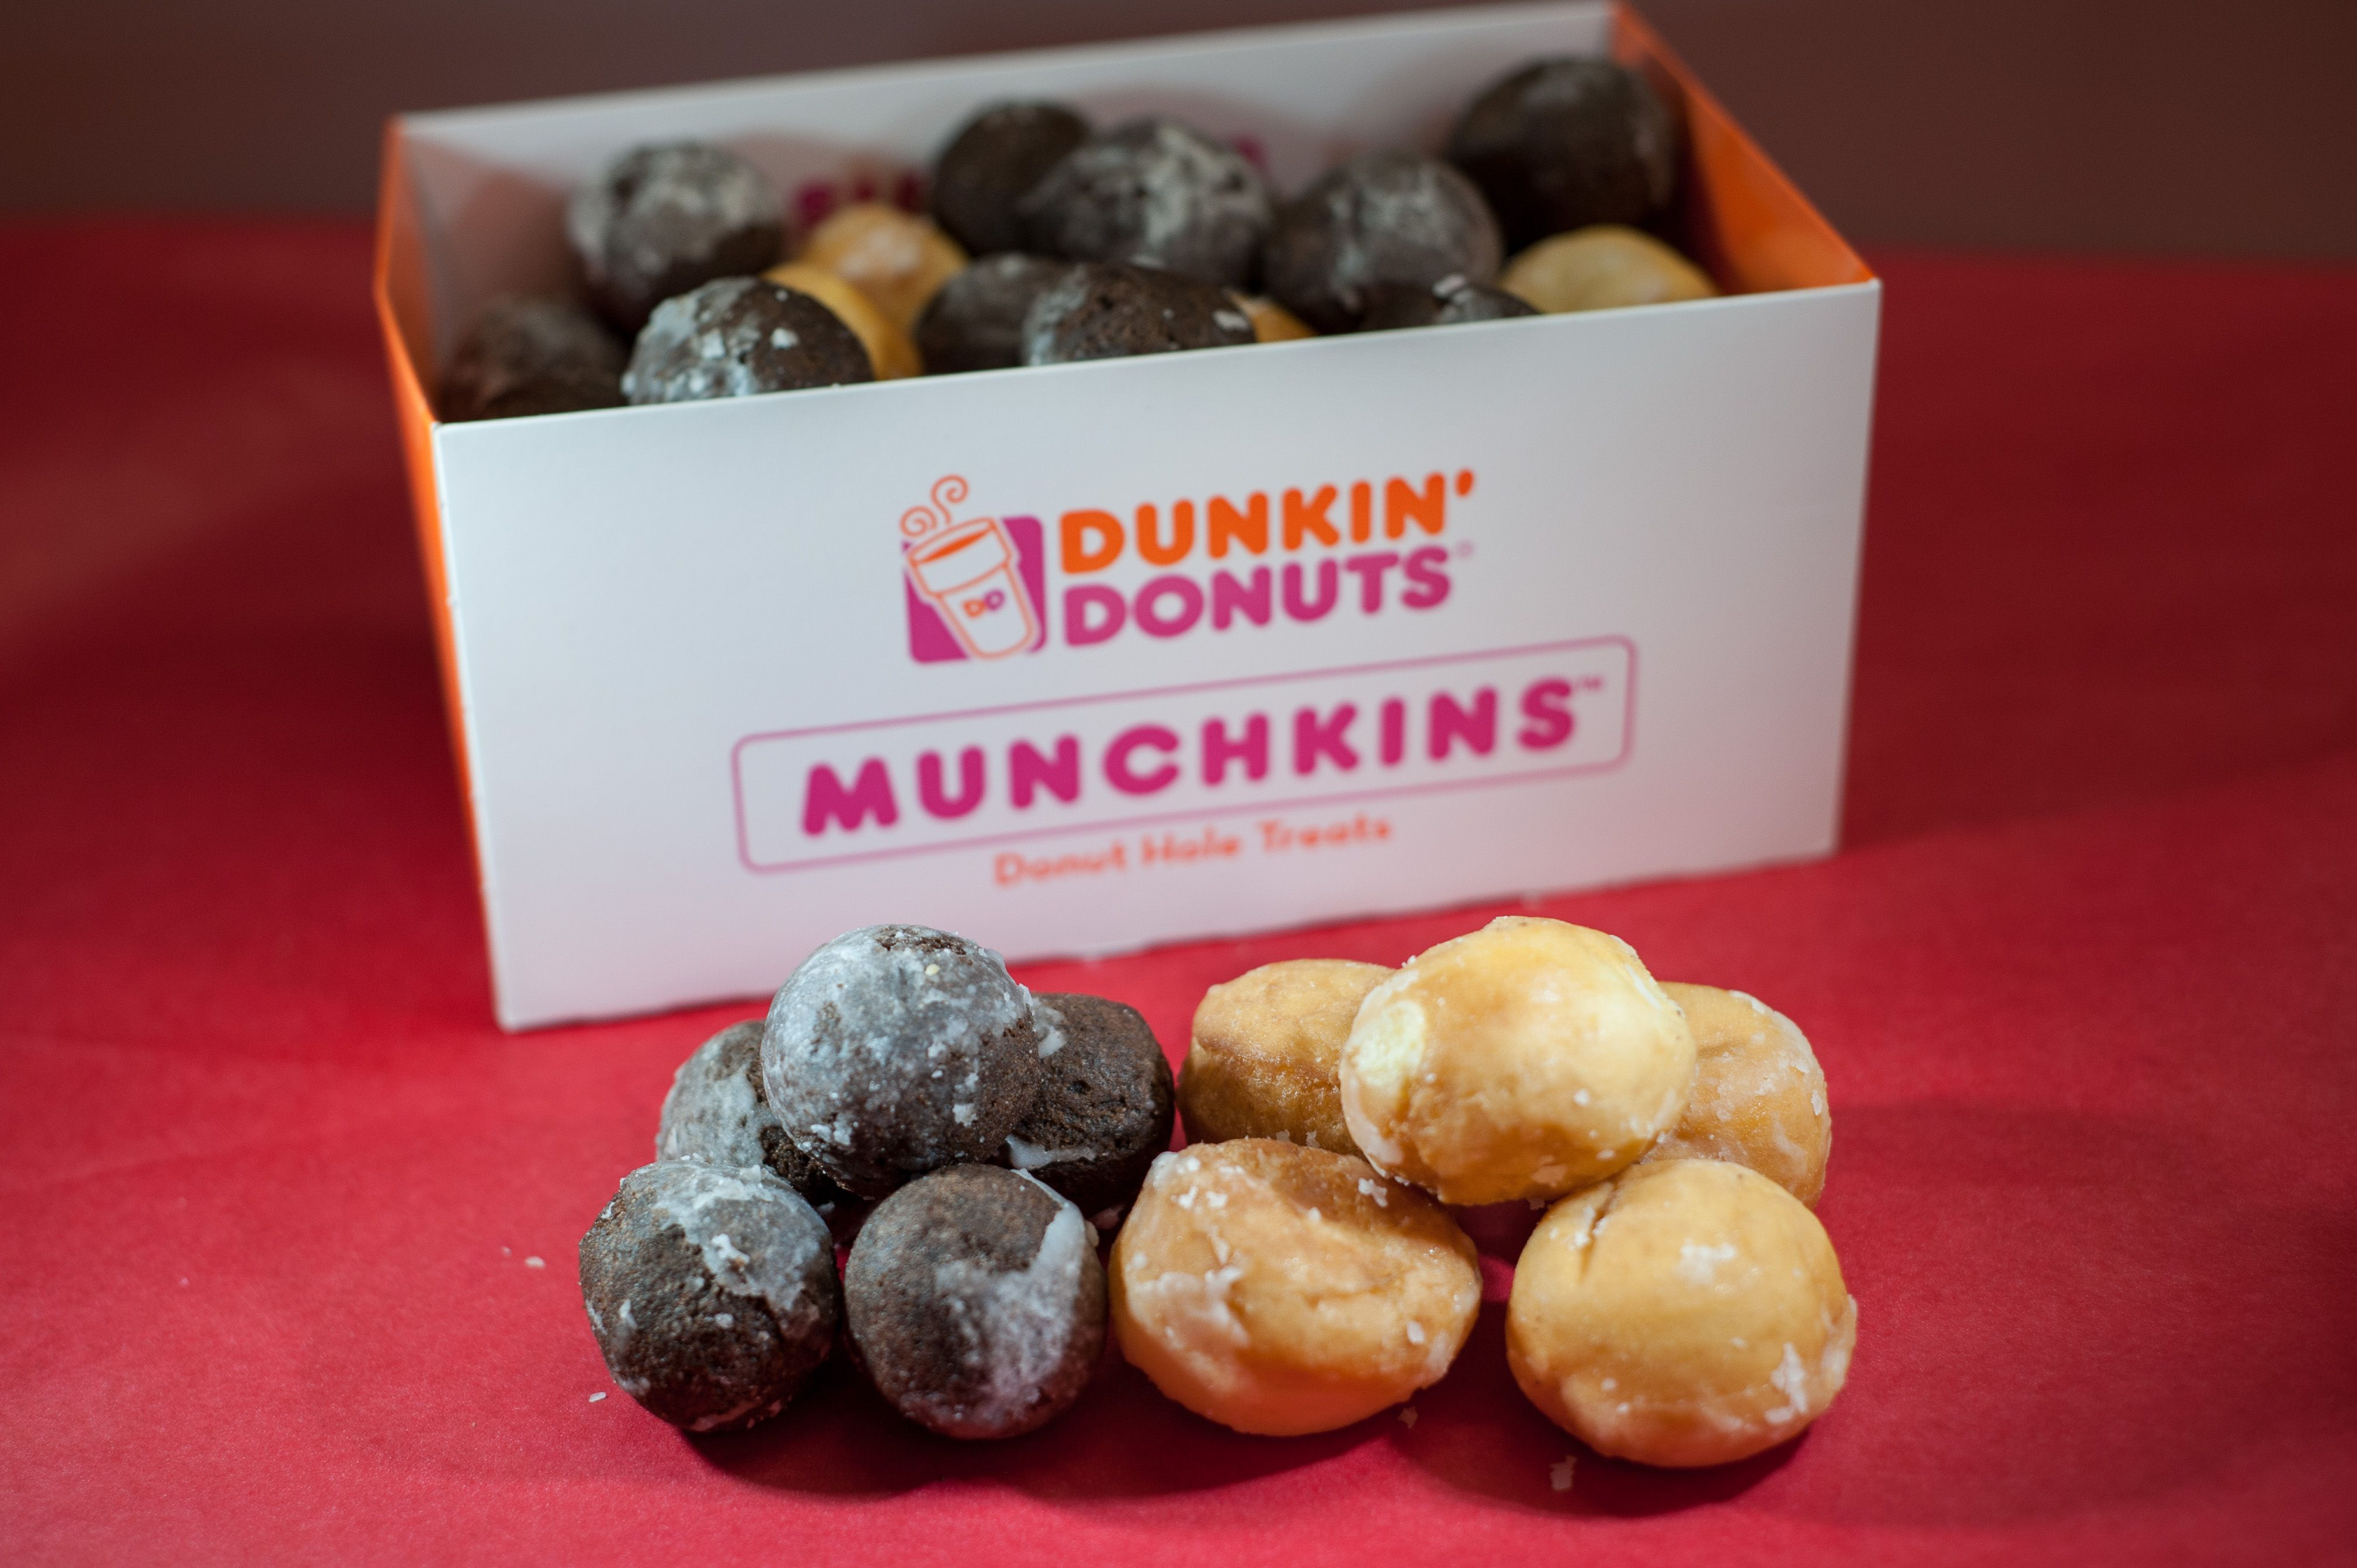 Munchkins - 50 Munchkins (Half Choc, Half Glaze) | Dunkin' Donuts ...